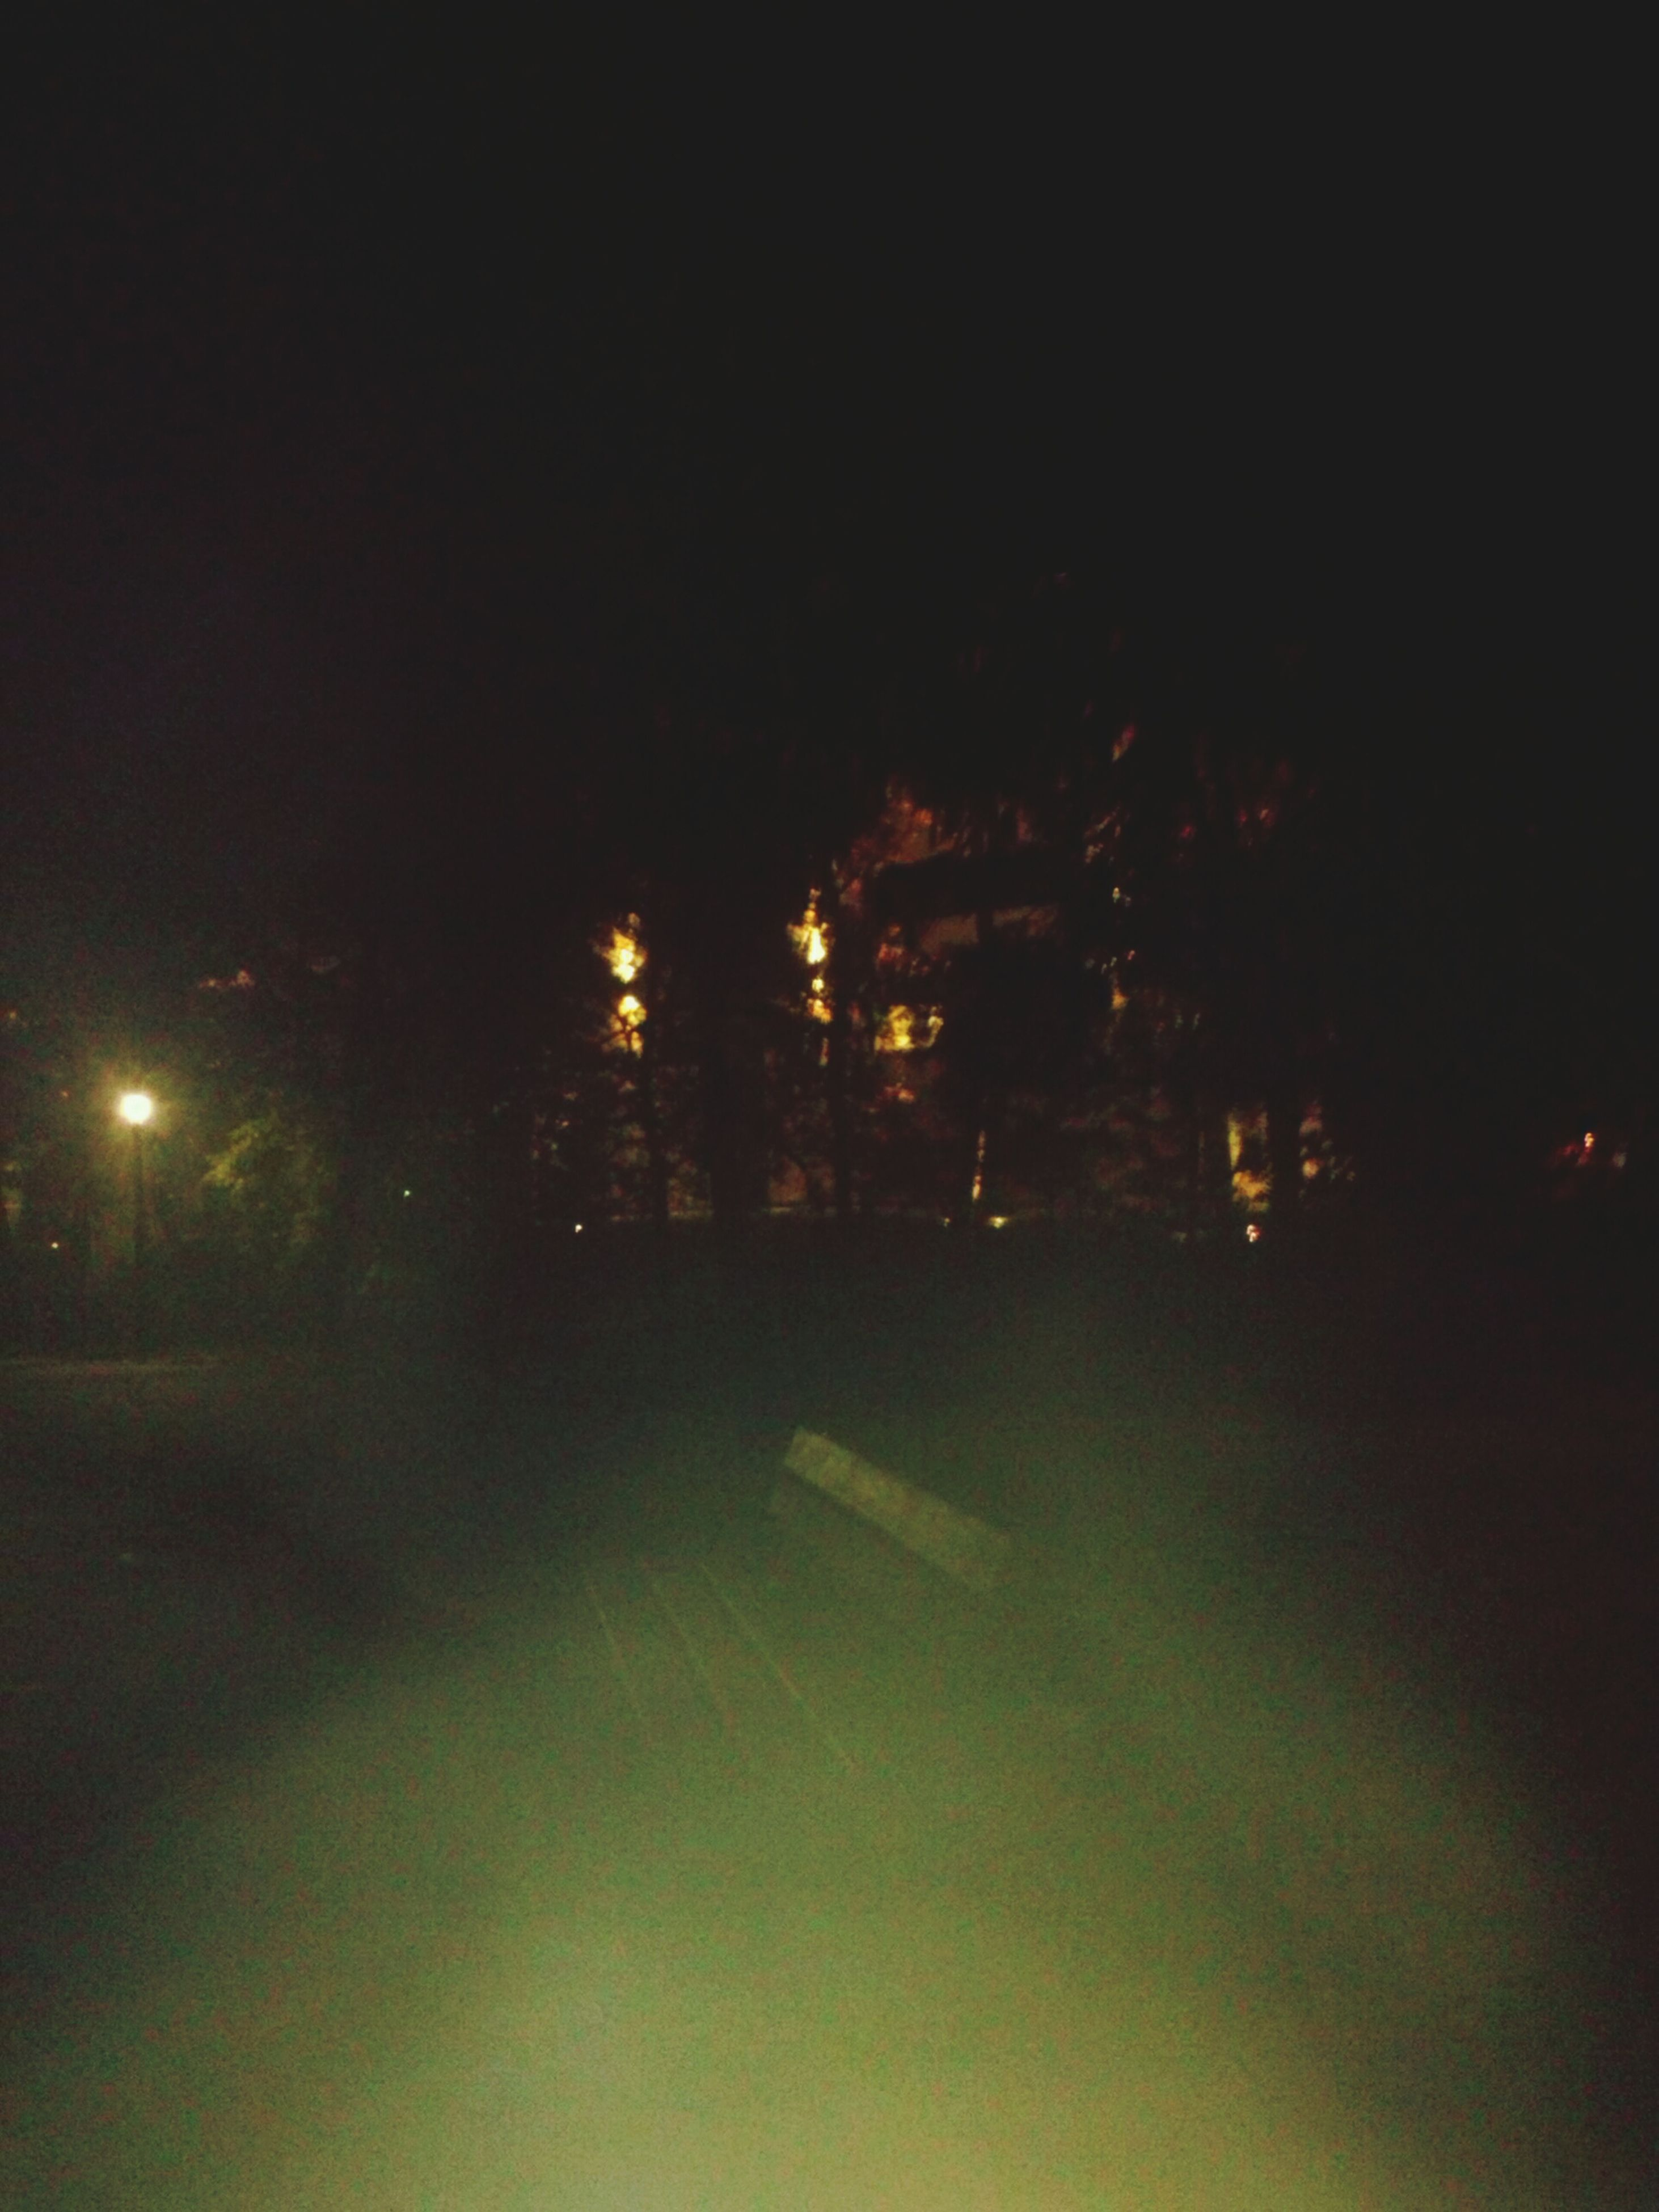 night, illuminated, street light, street, road, transportation, copy space, tree, clear sky, dark, lighting equipment, the way forward, car, light - natural phenomenon, outdoors, silhouette, no people, land vehicle, city, building exterior